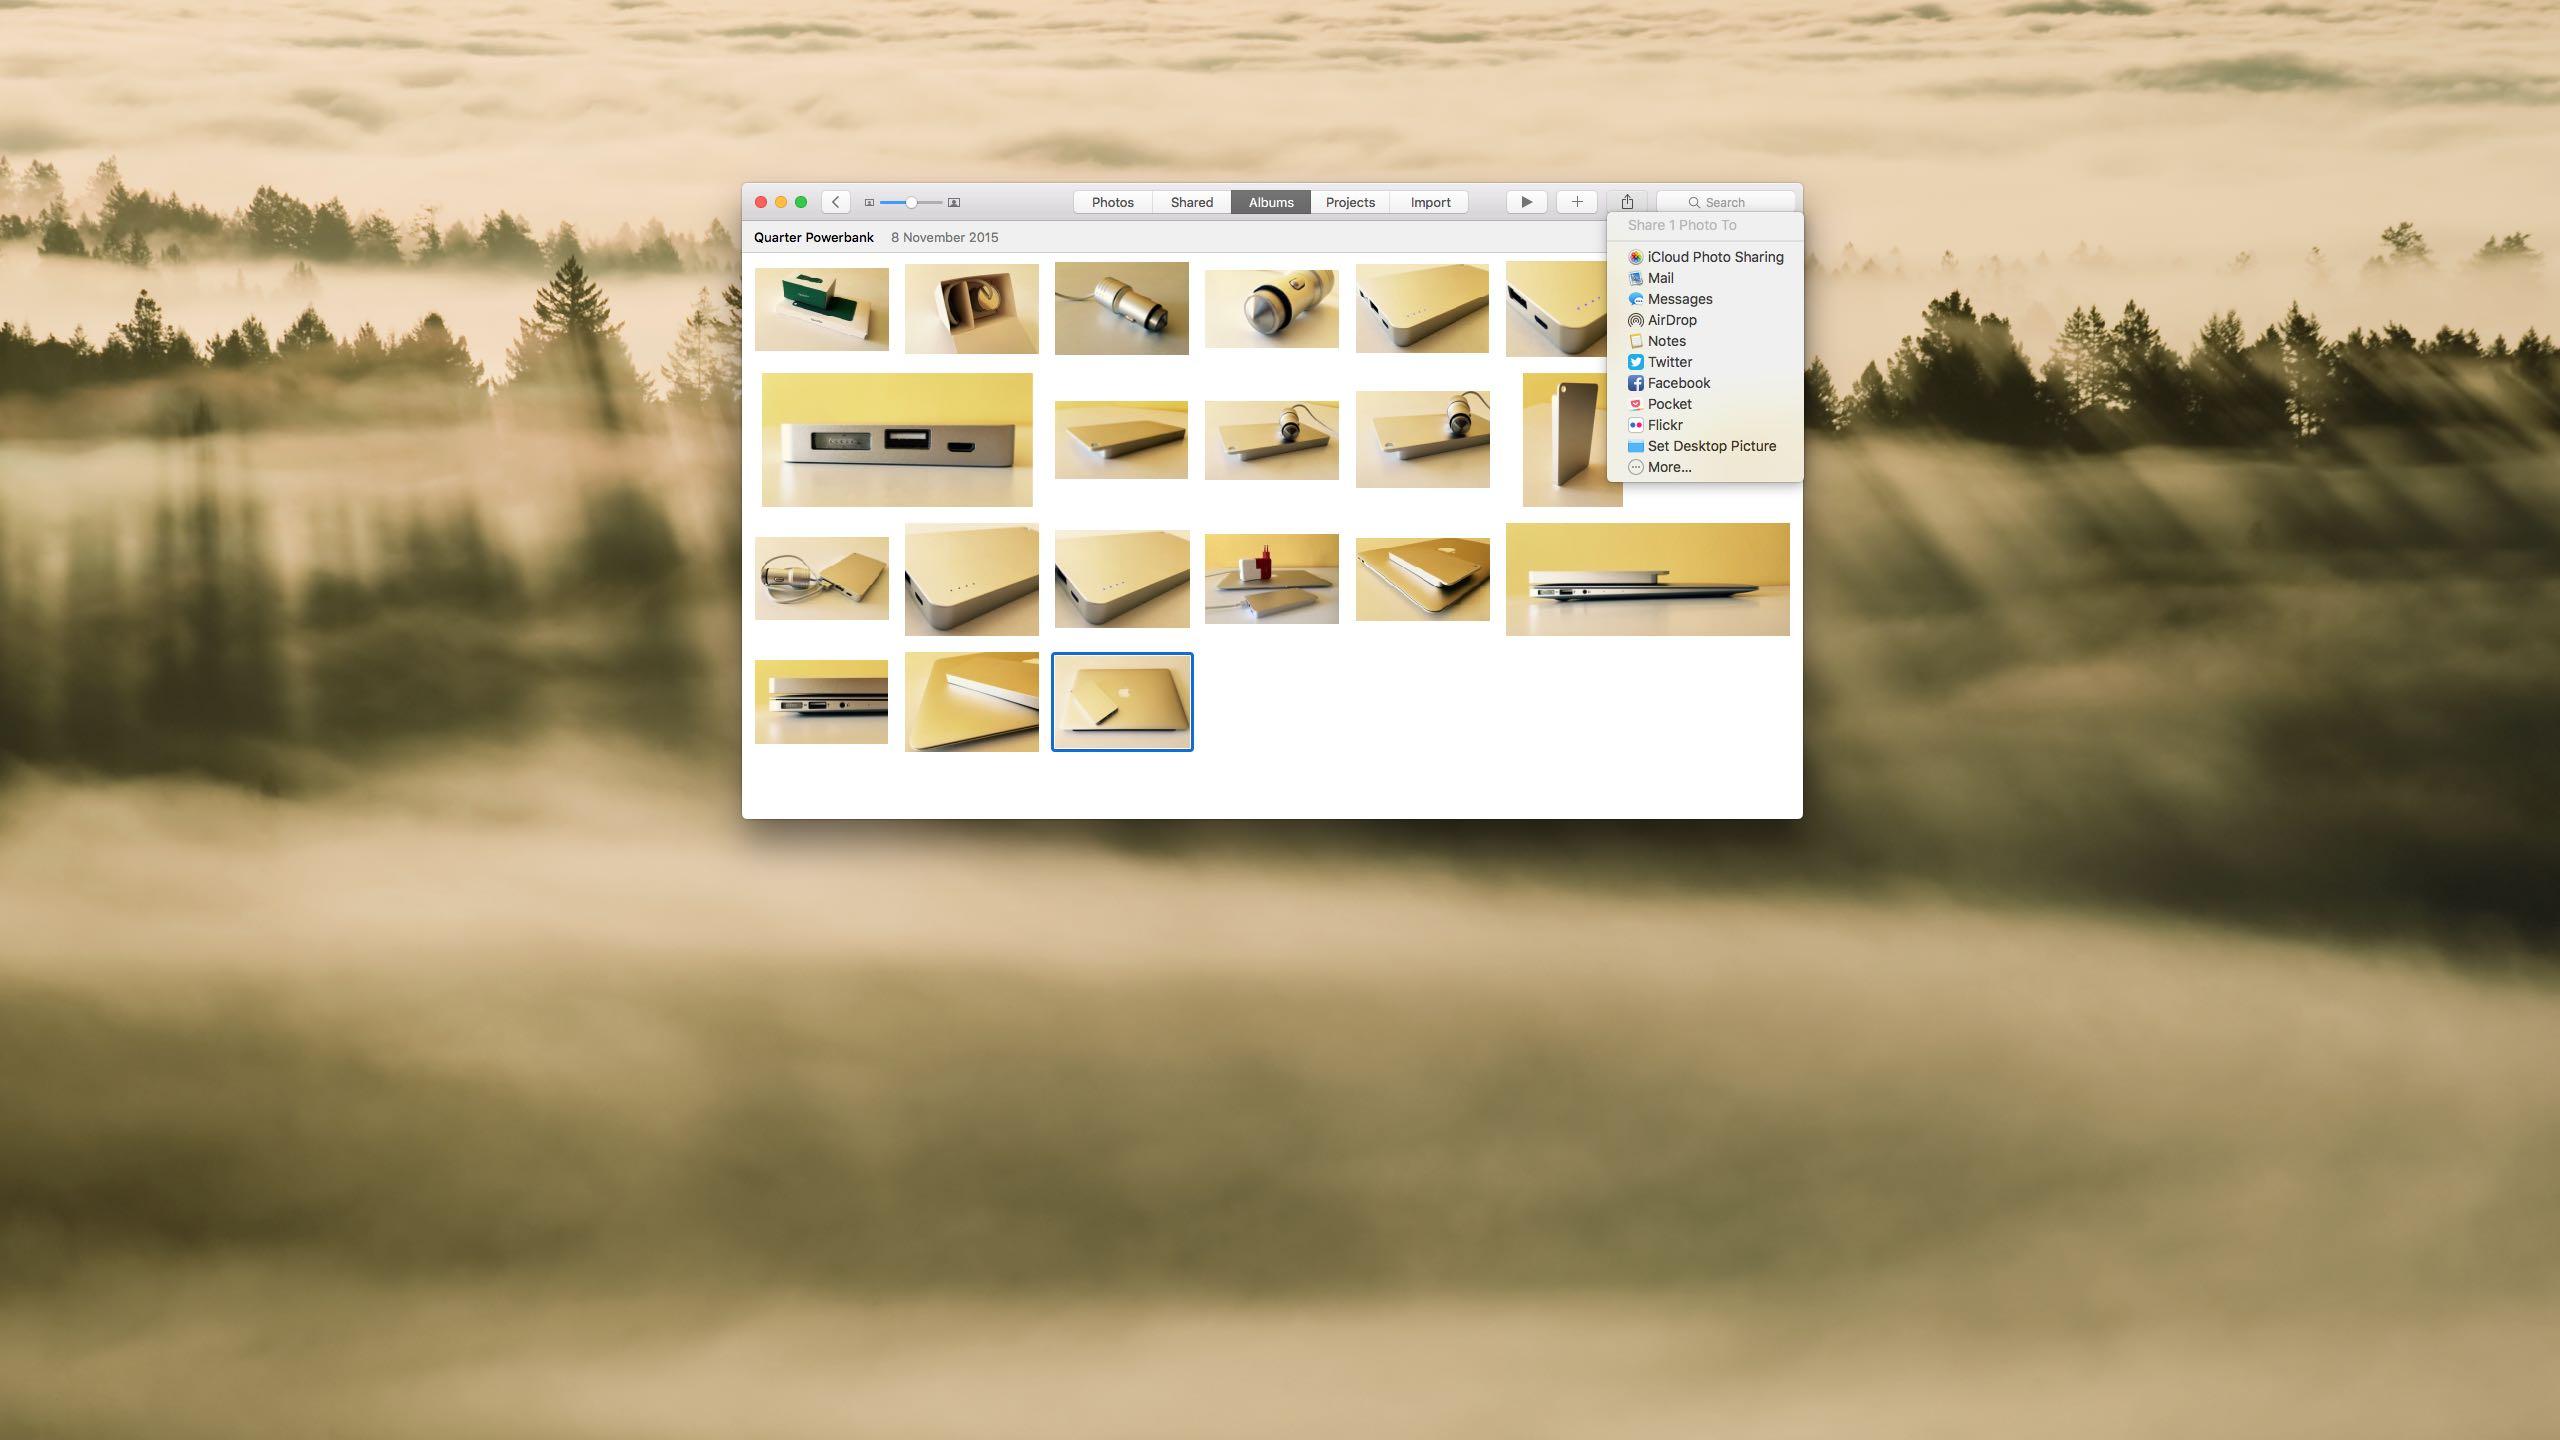 Photos-for-OS-X-how-to-set-image-as-desktop-wallpaper-Mac-